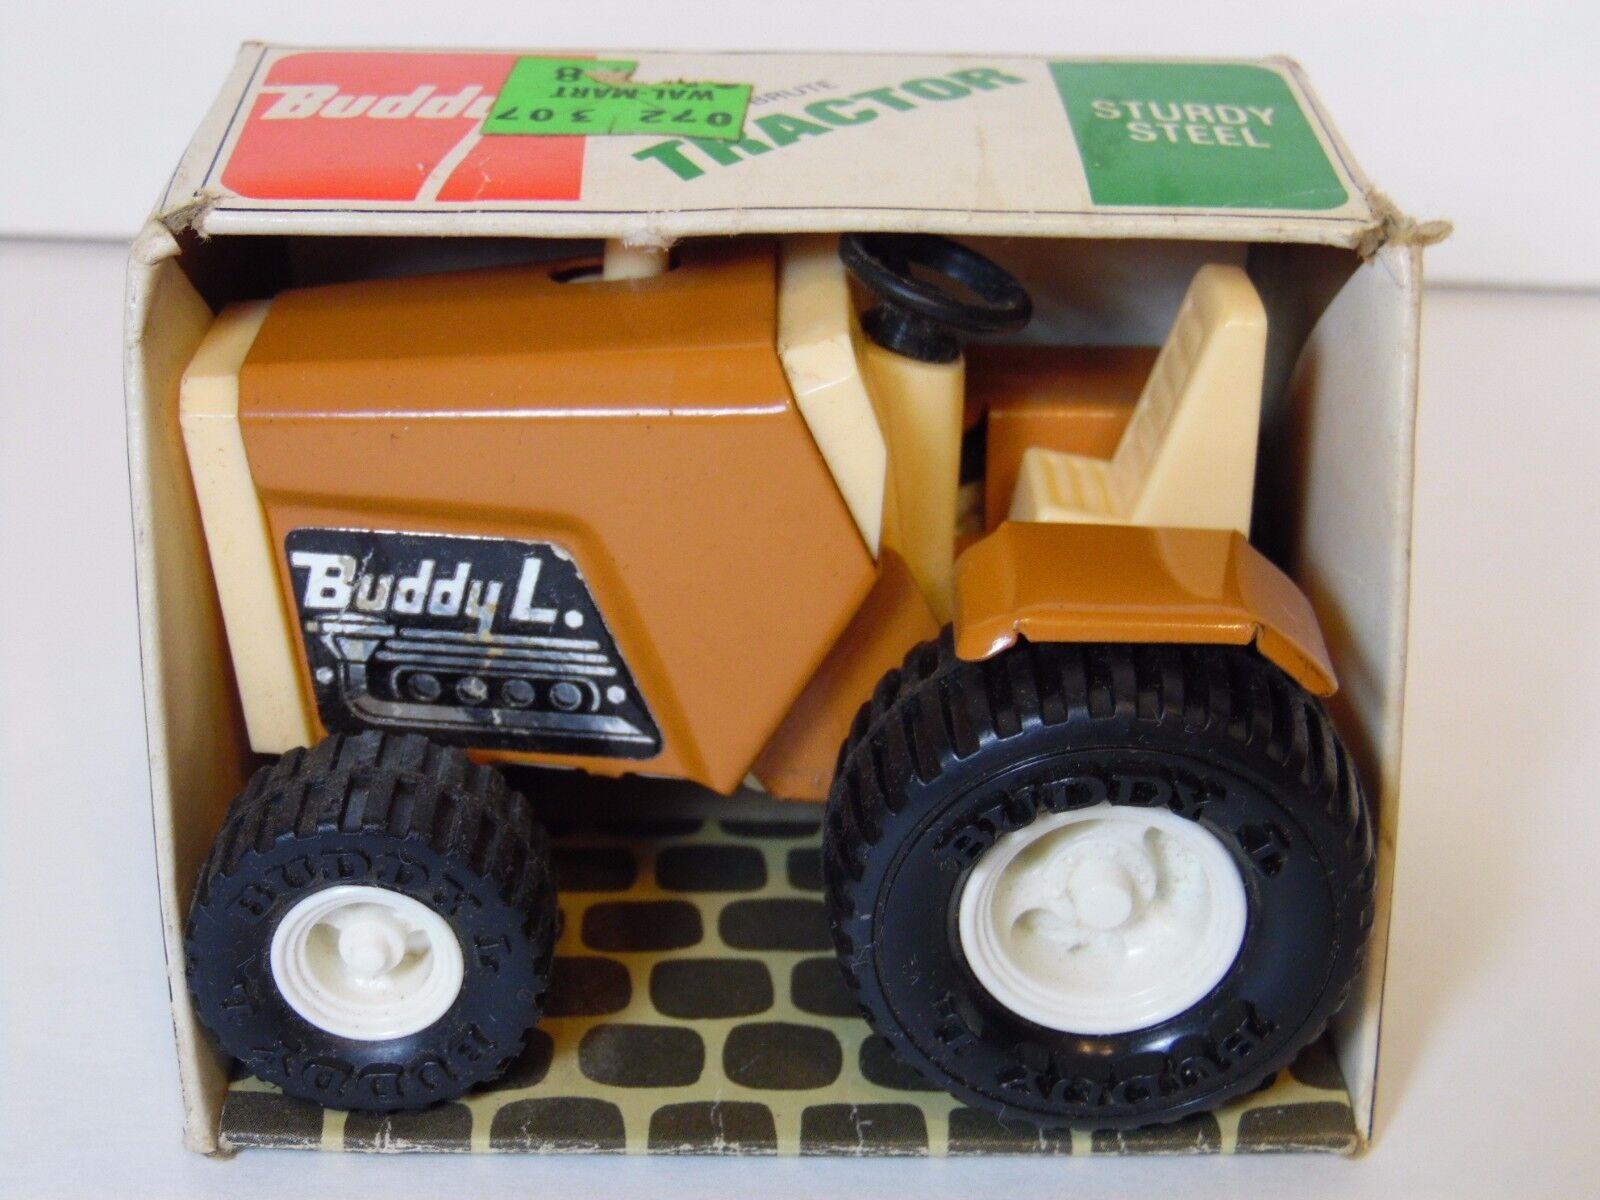 OLD VINTAGE 1970s BUDDY L STURDY STEEL BRUTE TRACTOR FARM TOY 4926 ORIGINAL BOX